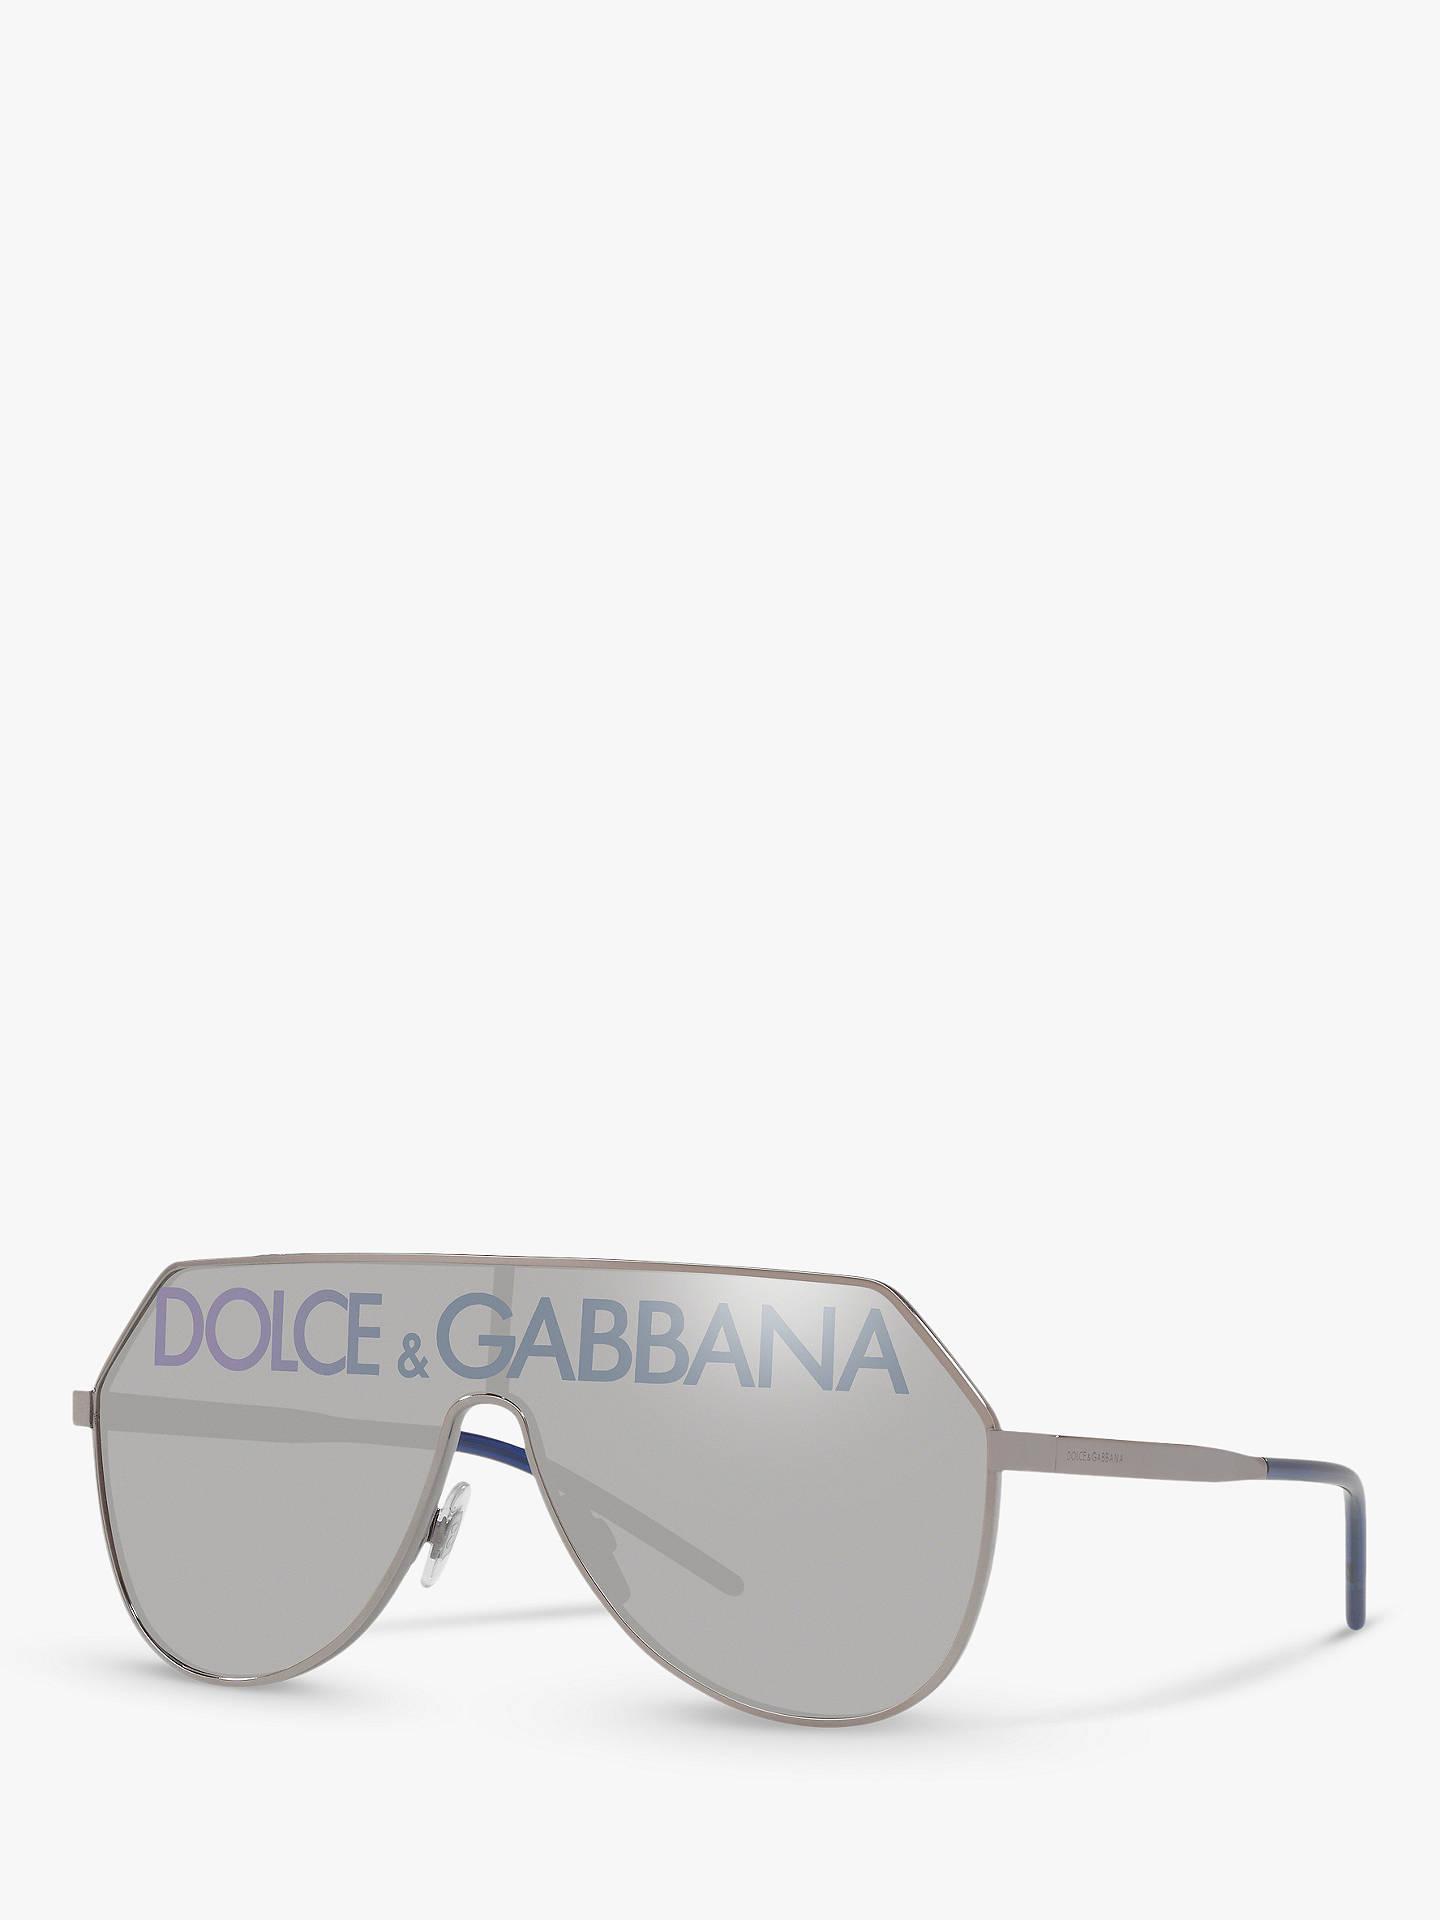 ff01b58b3c70 Dolce   Gabbana DG2221 Men s Aviator Sunglasses at John Lewis   Partners